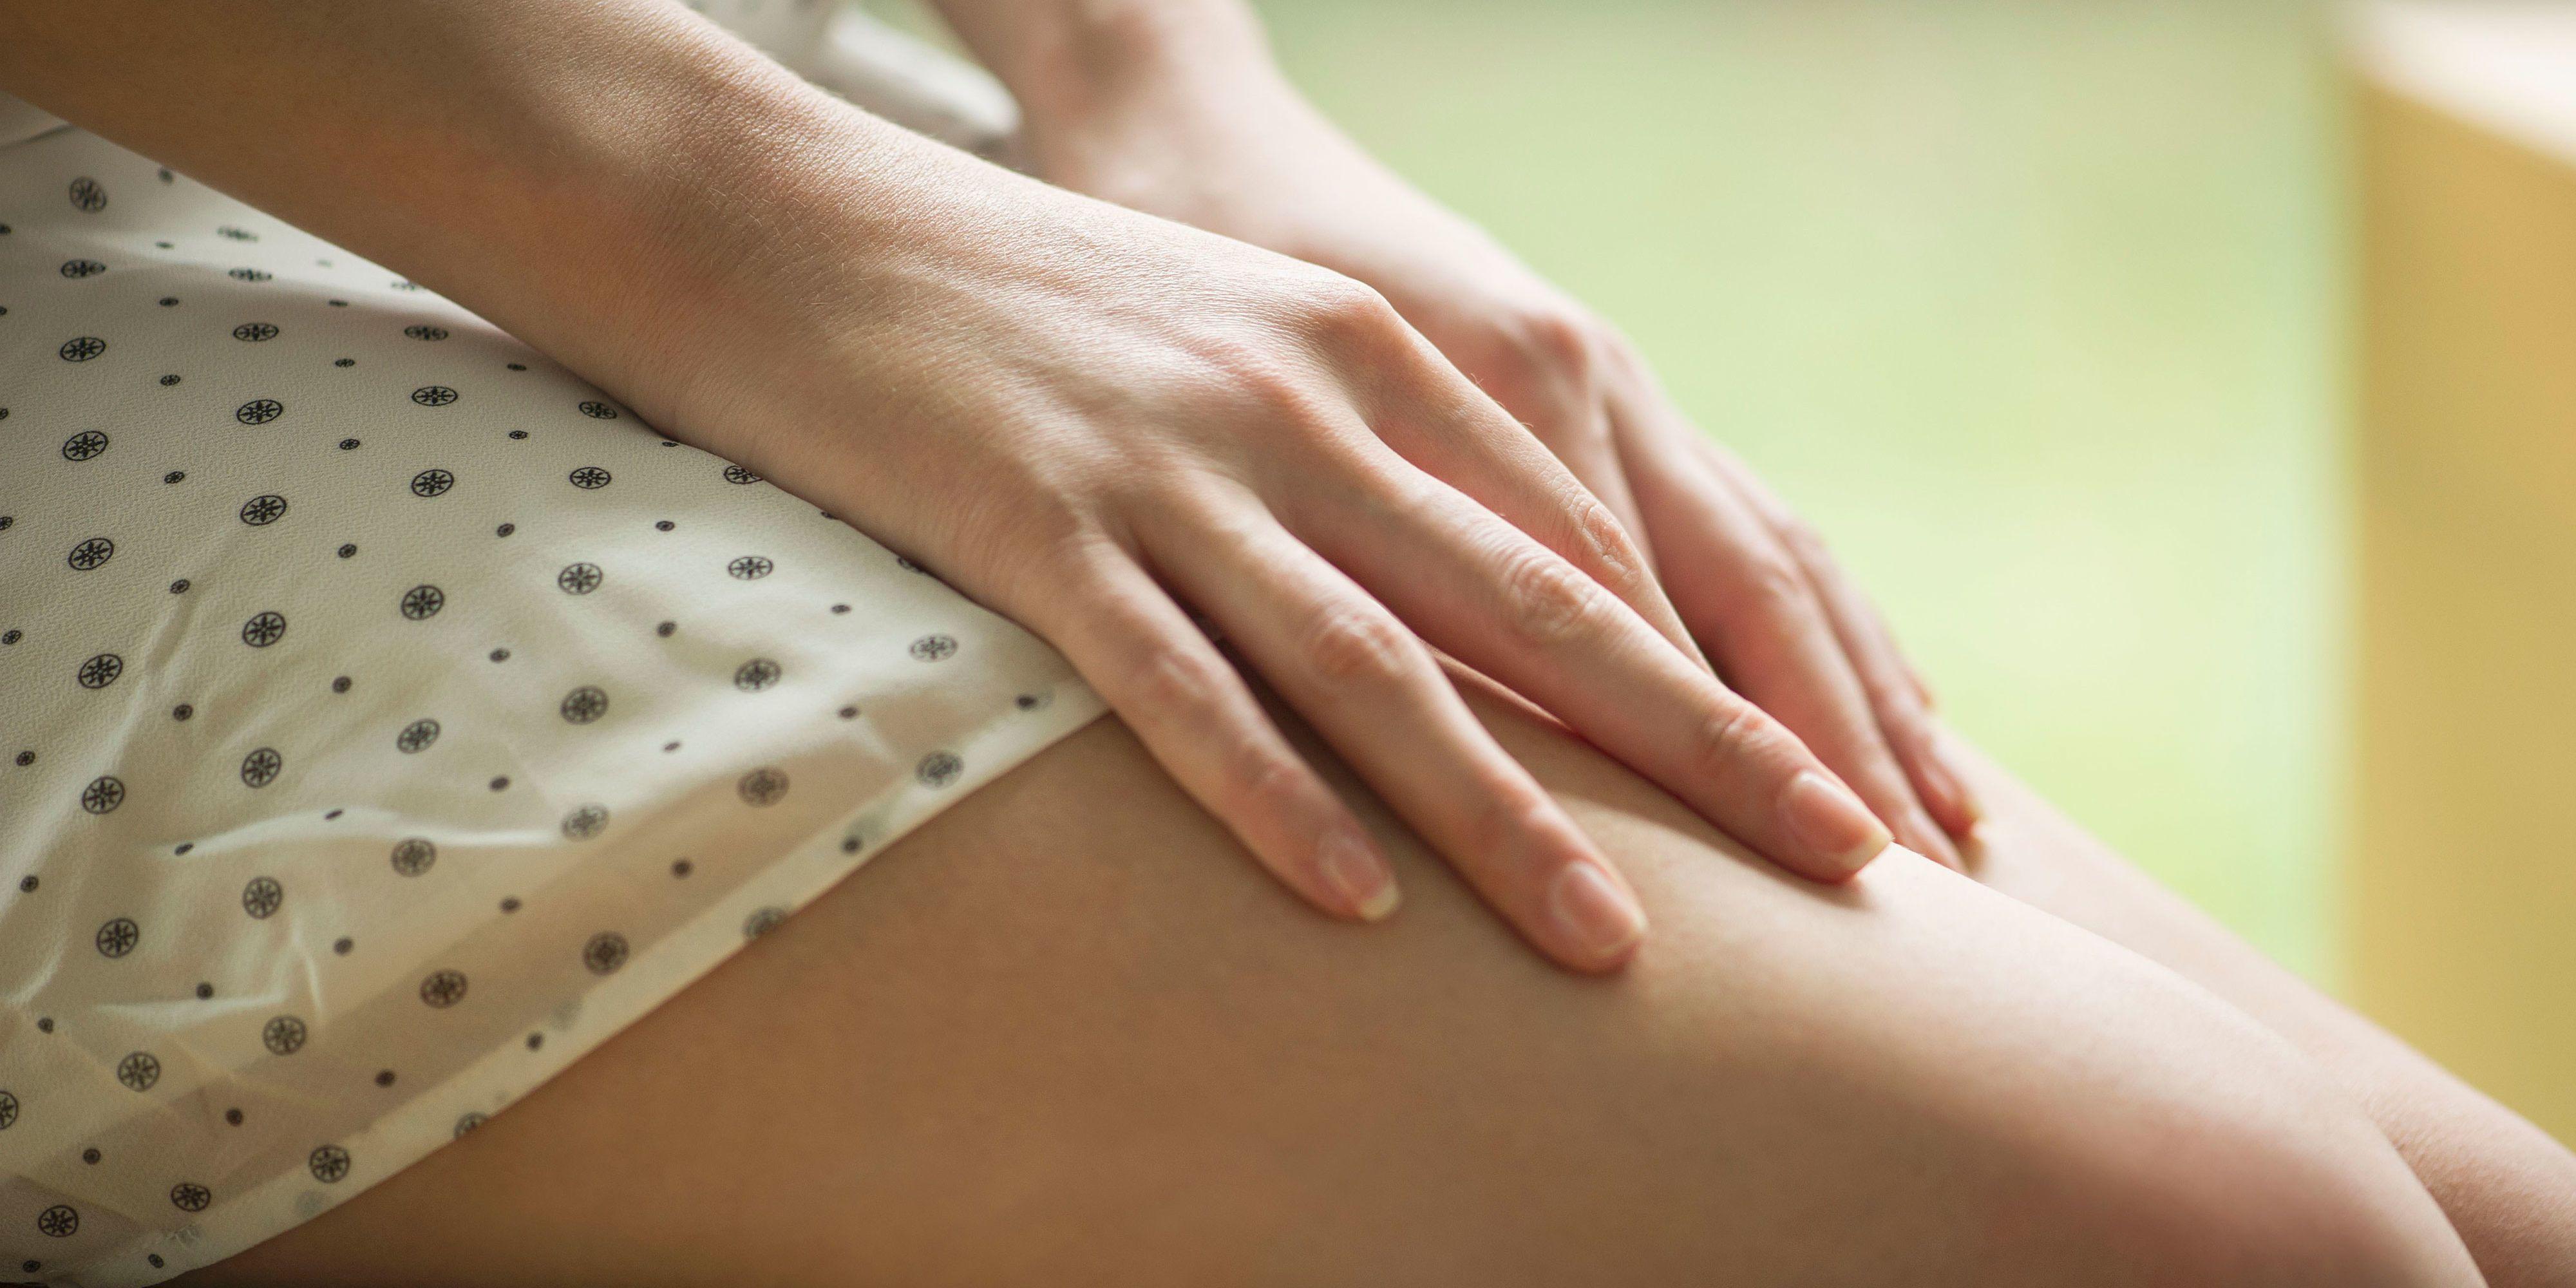 Lower abdominal discomfort after masturbation